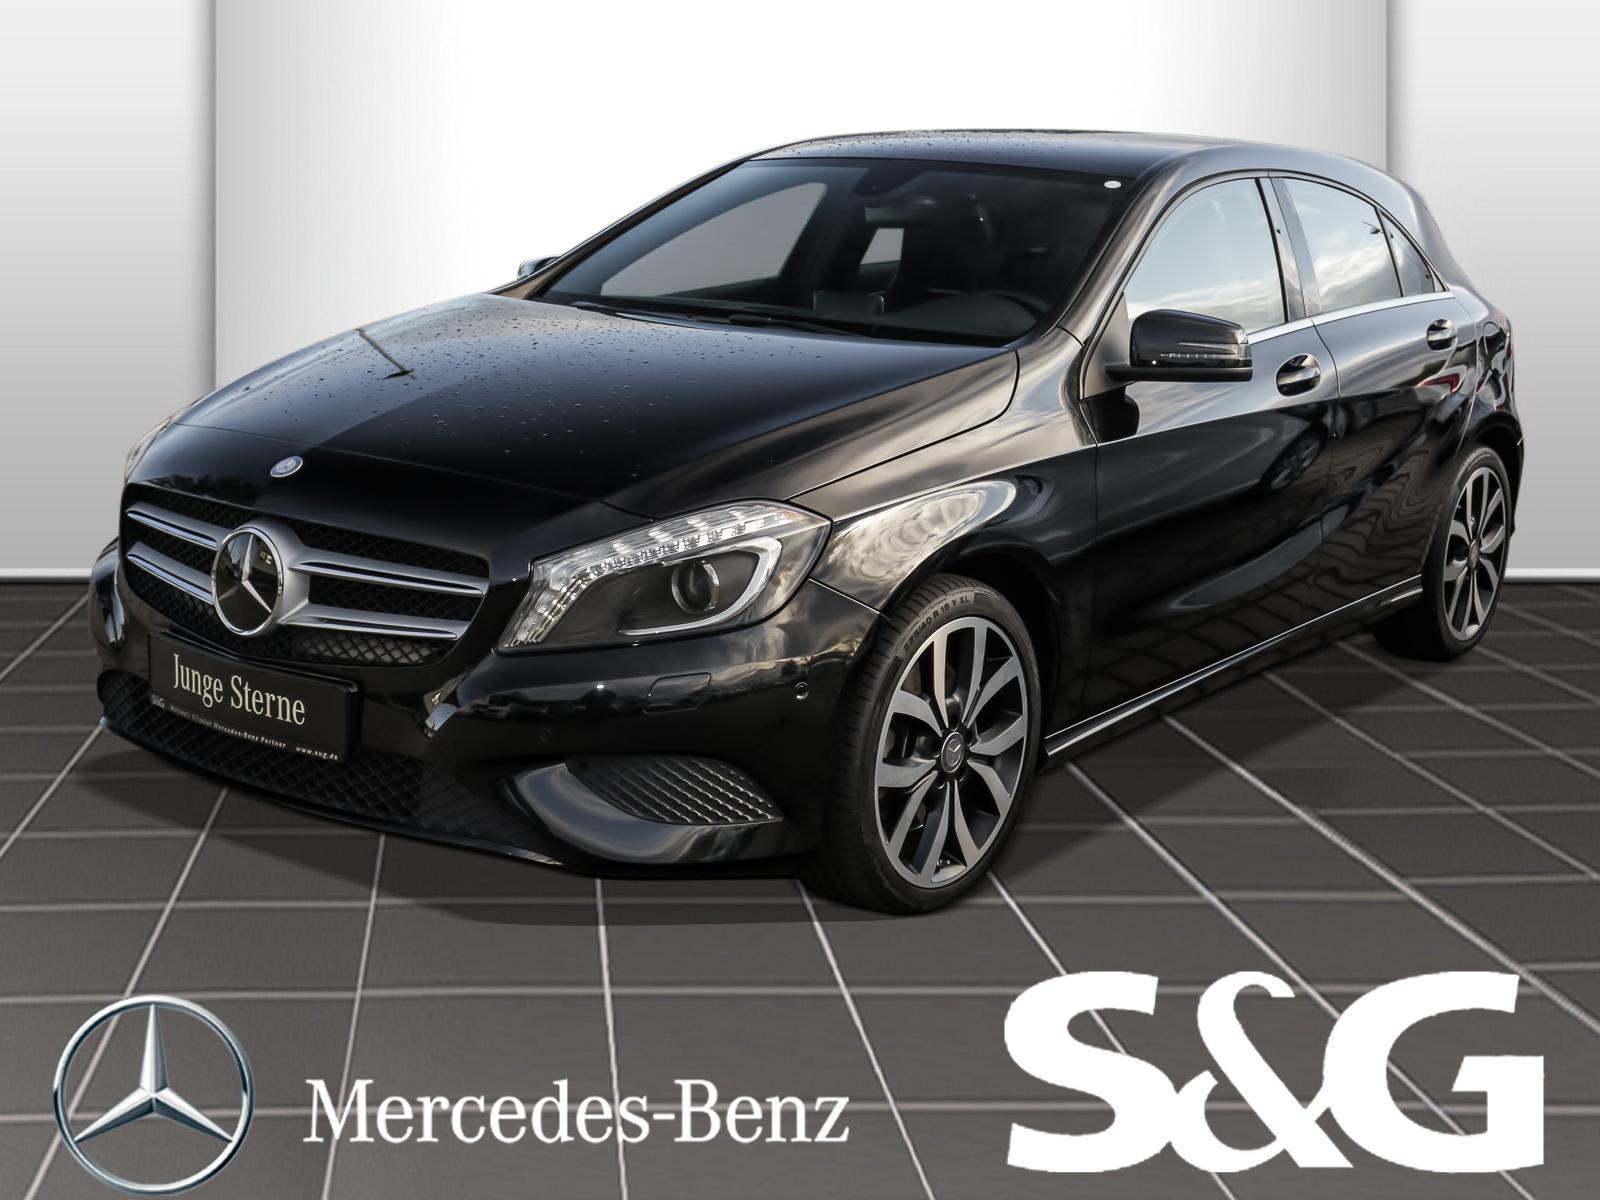 Mercedes-Benz A 250 Urban Navi/Distronic/Standhzg./Xenon/PDC//, Jahr 2014, Benzin